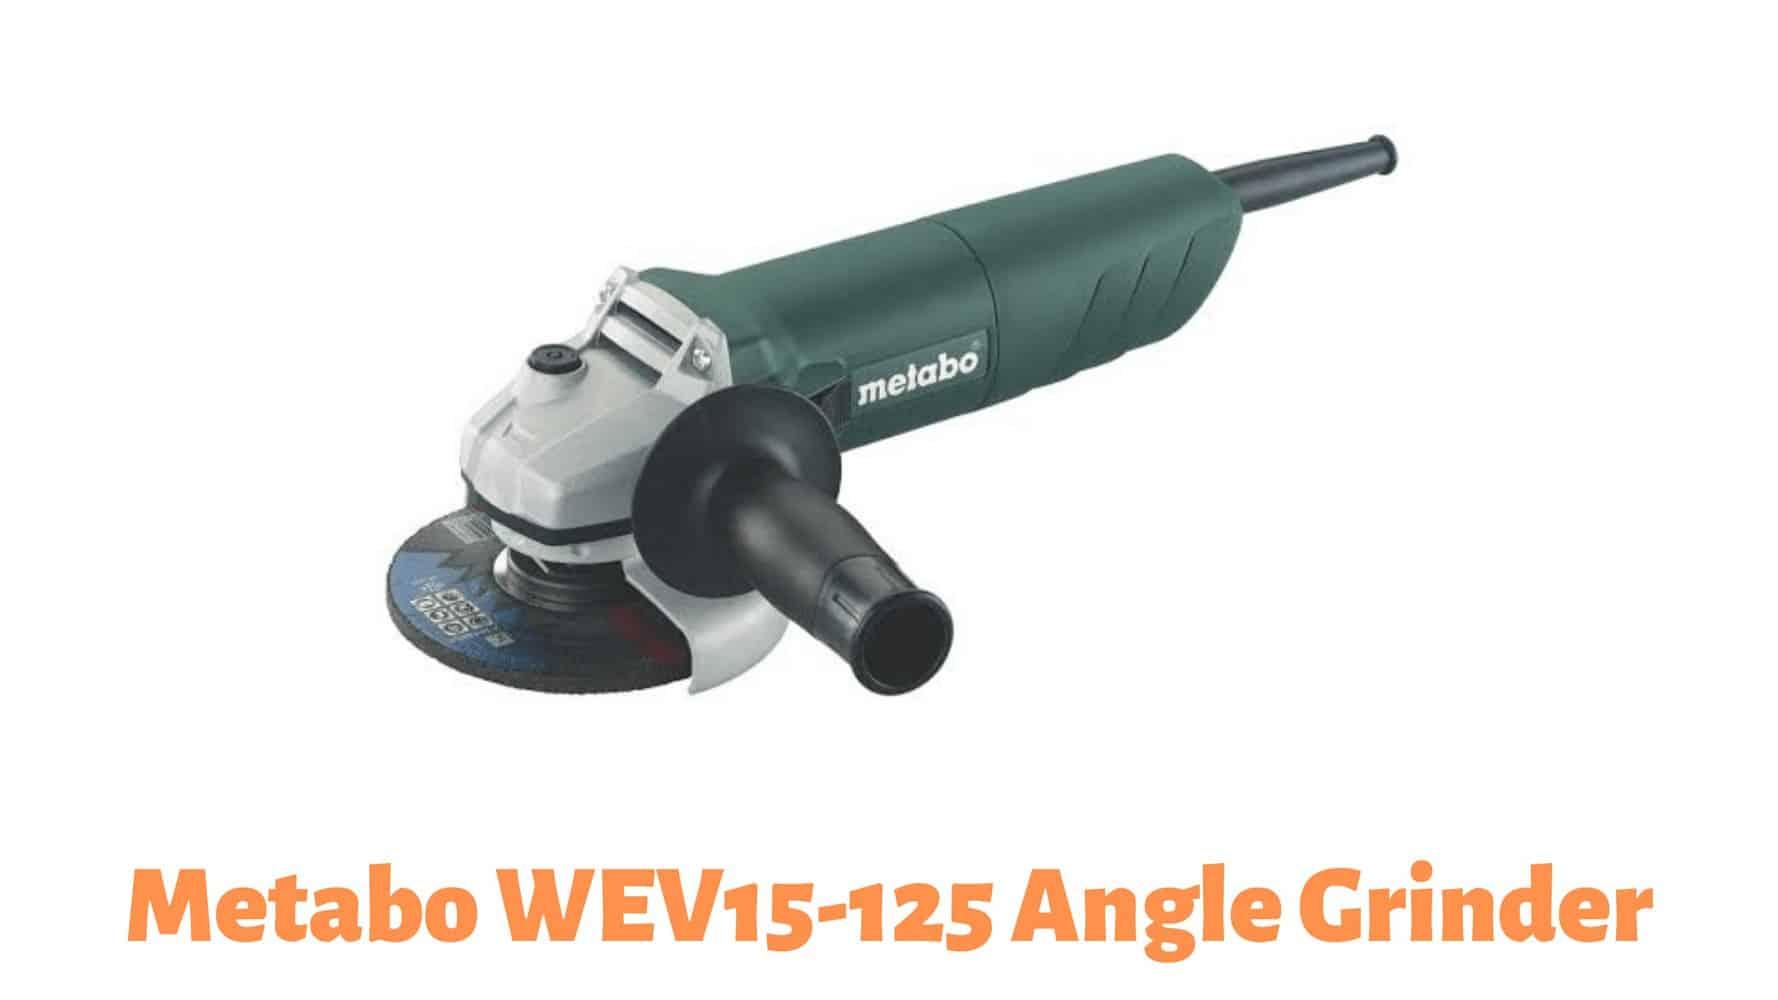 Metabo WEV15-125 Angle Grinder